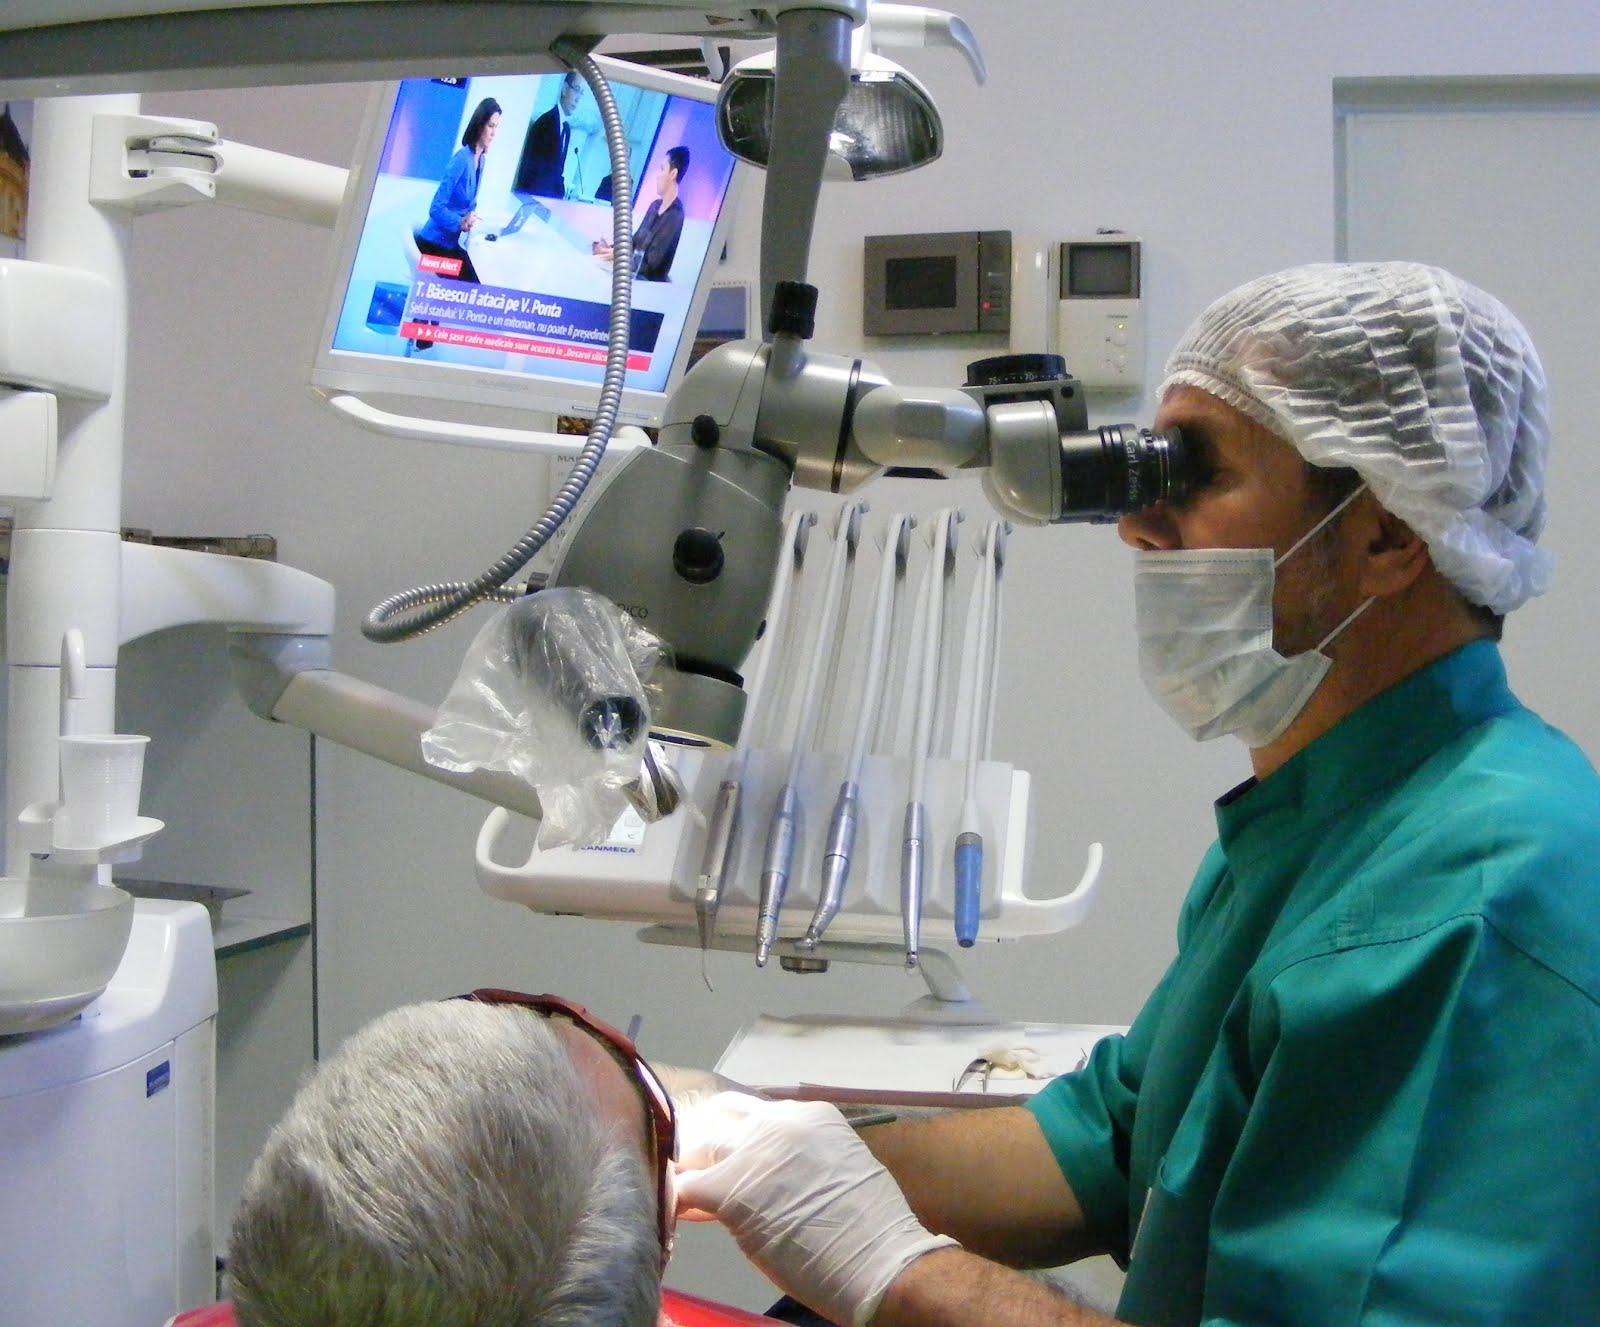 Dr Cazacu working on dental microscope